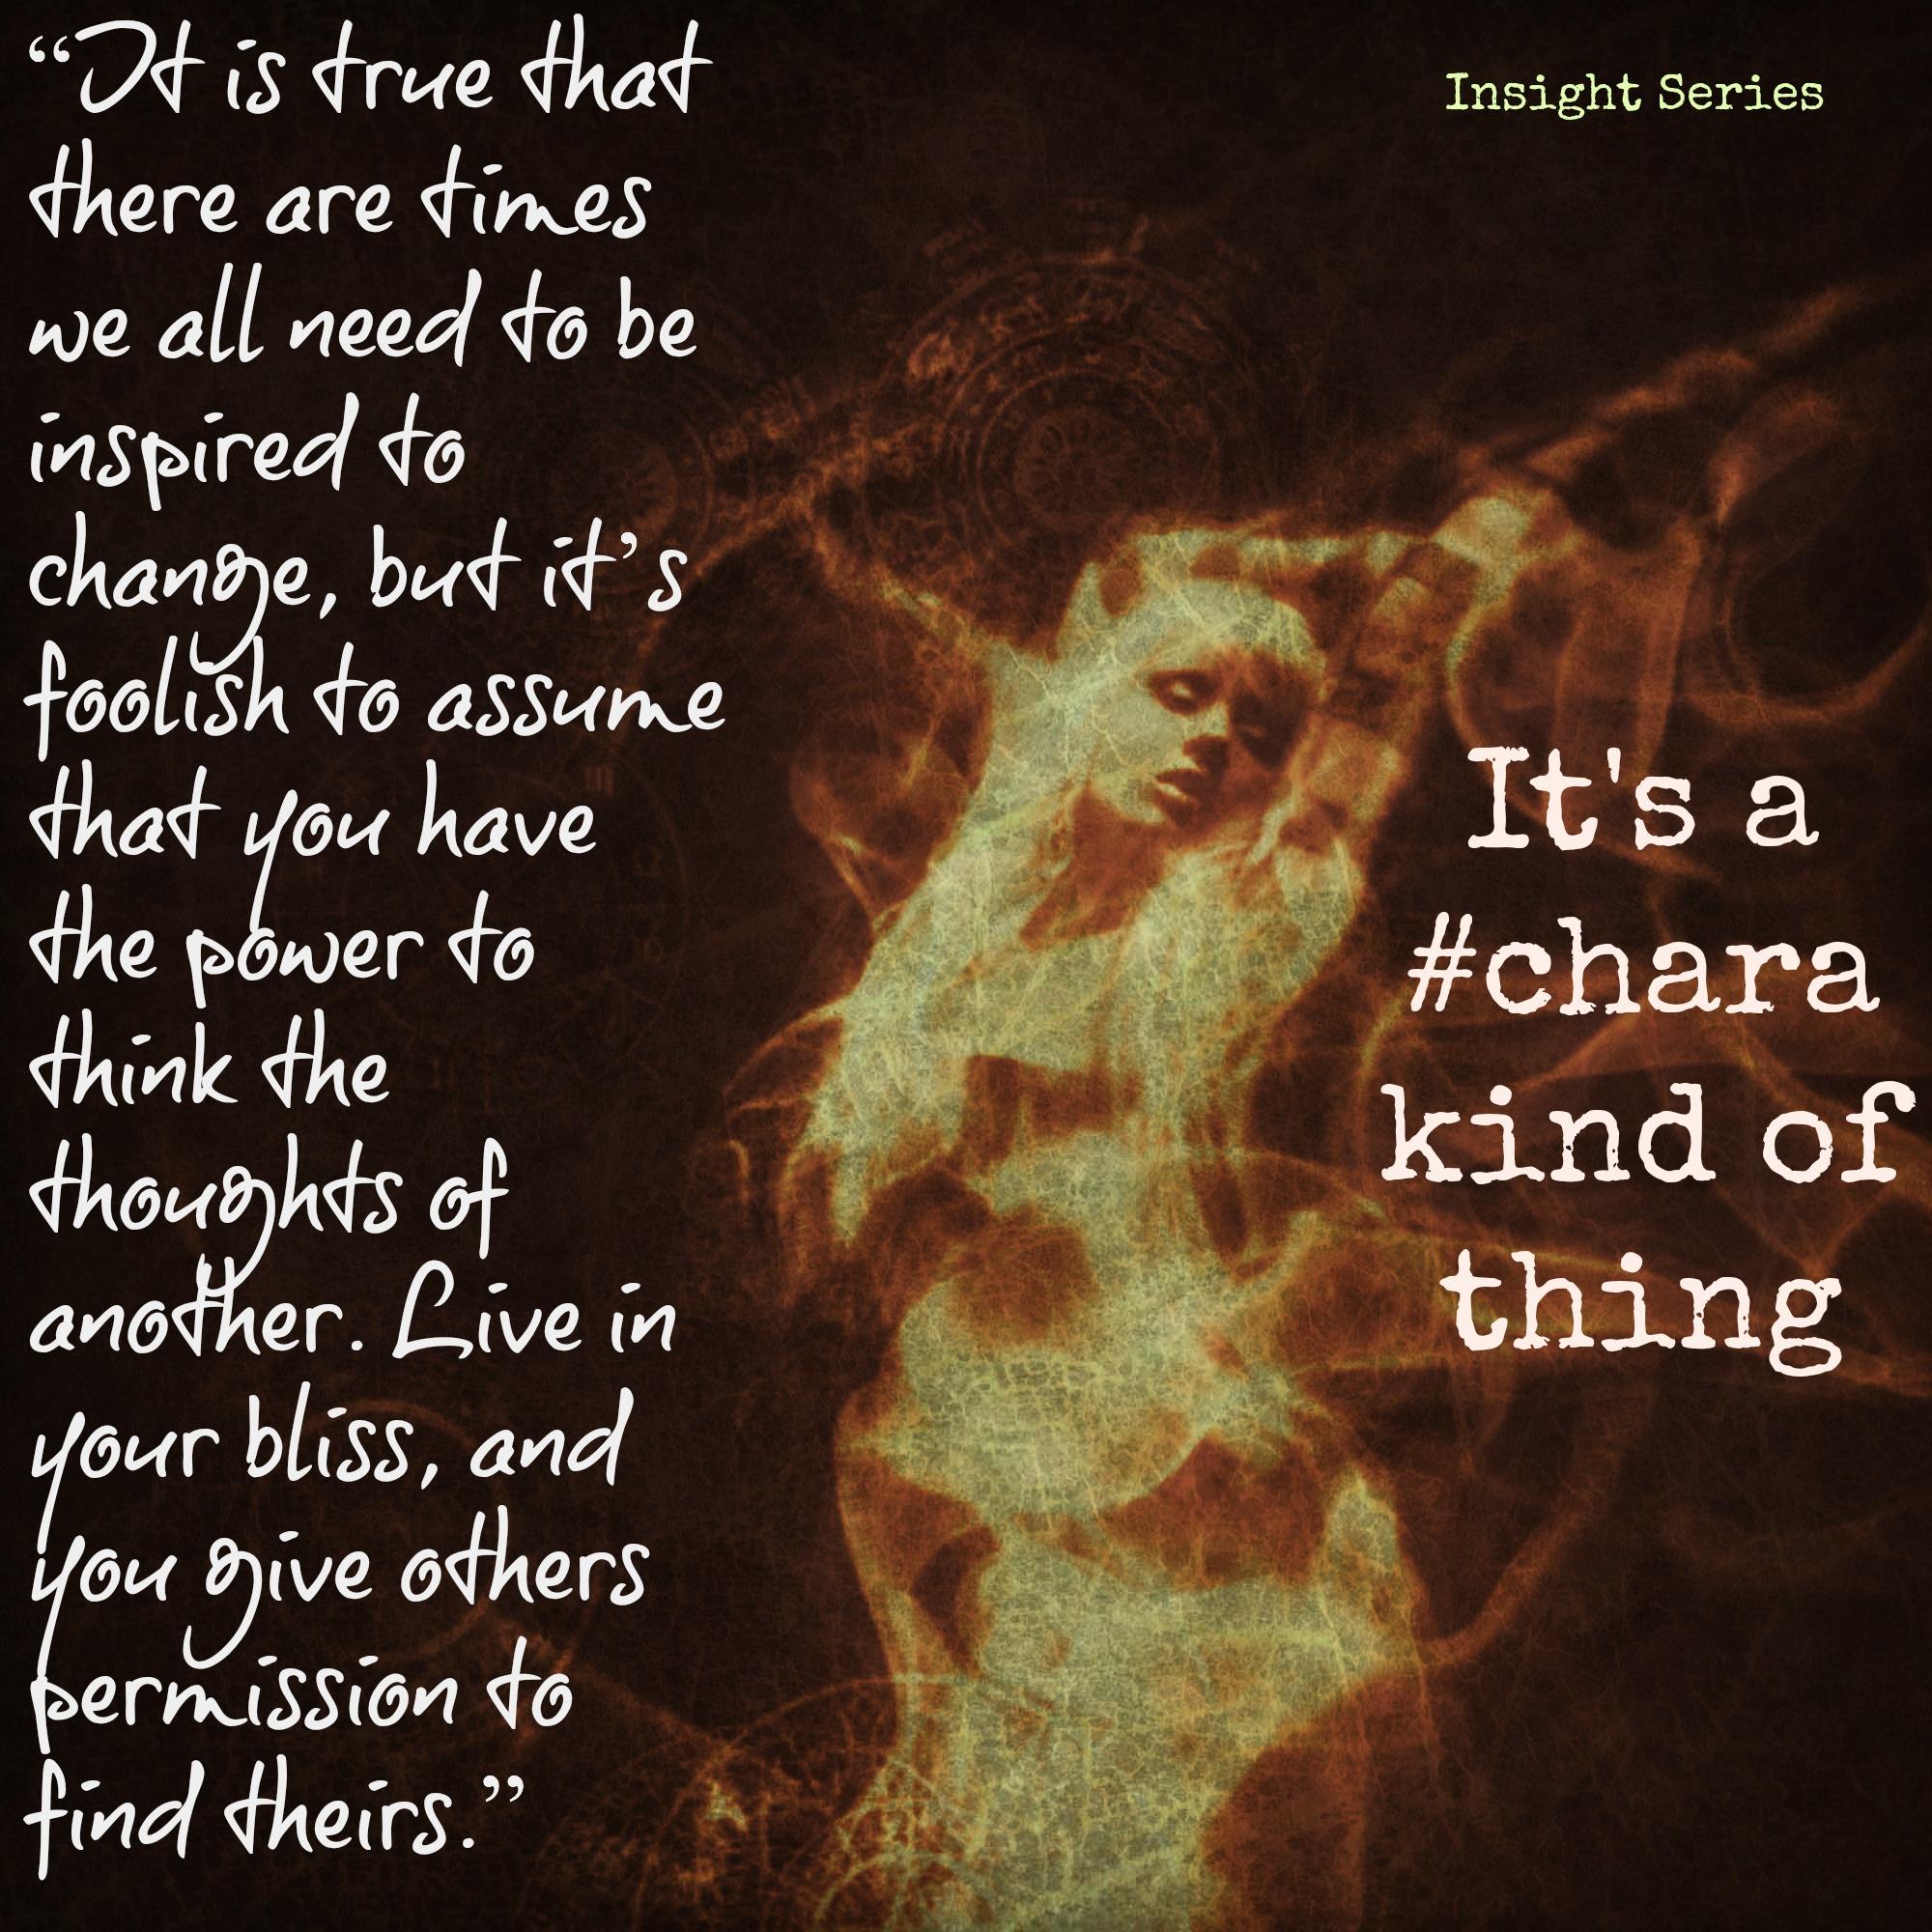 4#chara.jpg